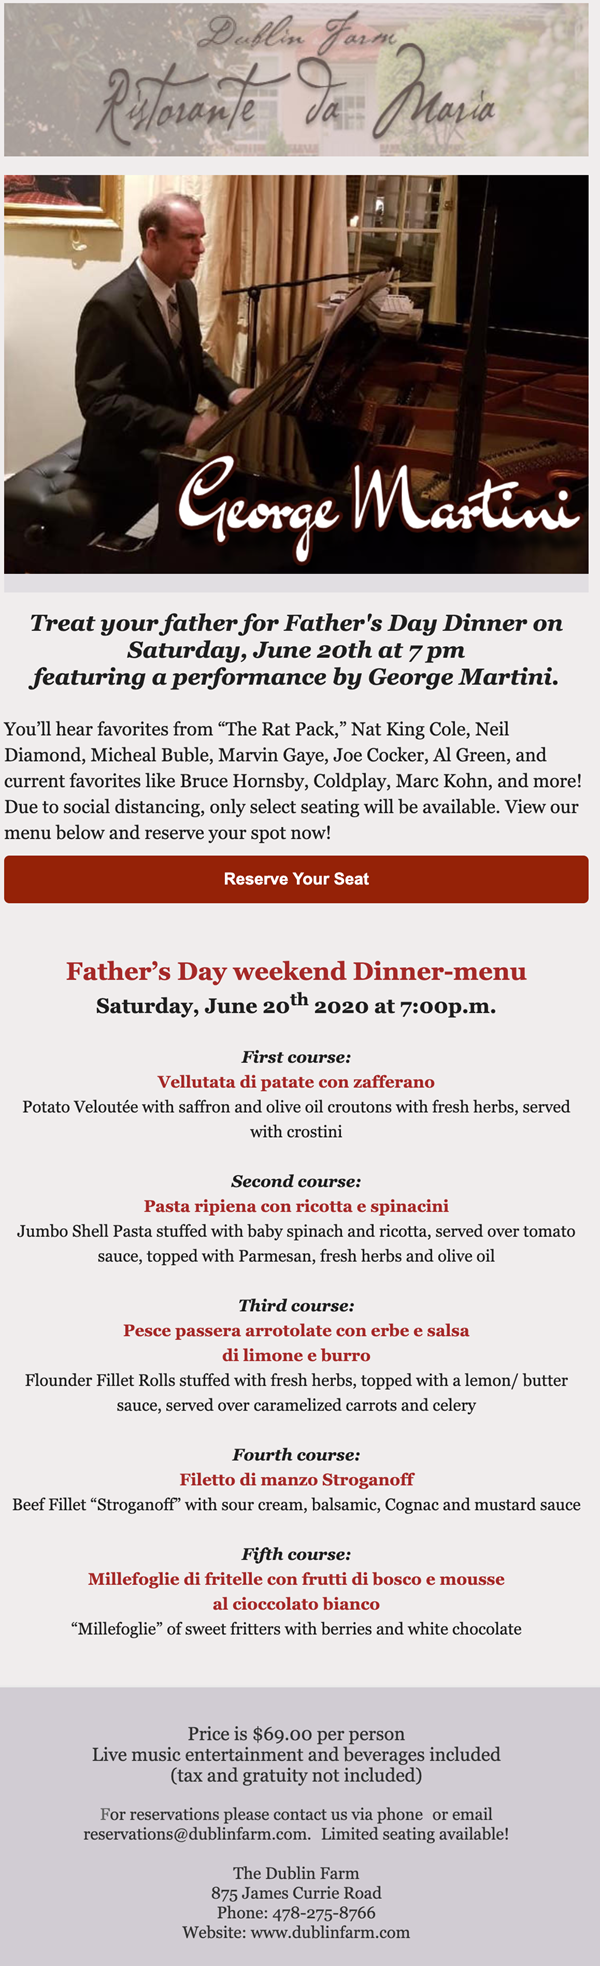 father's day dinner at dublin farm